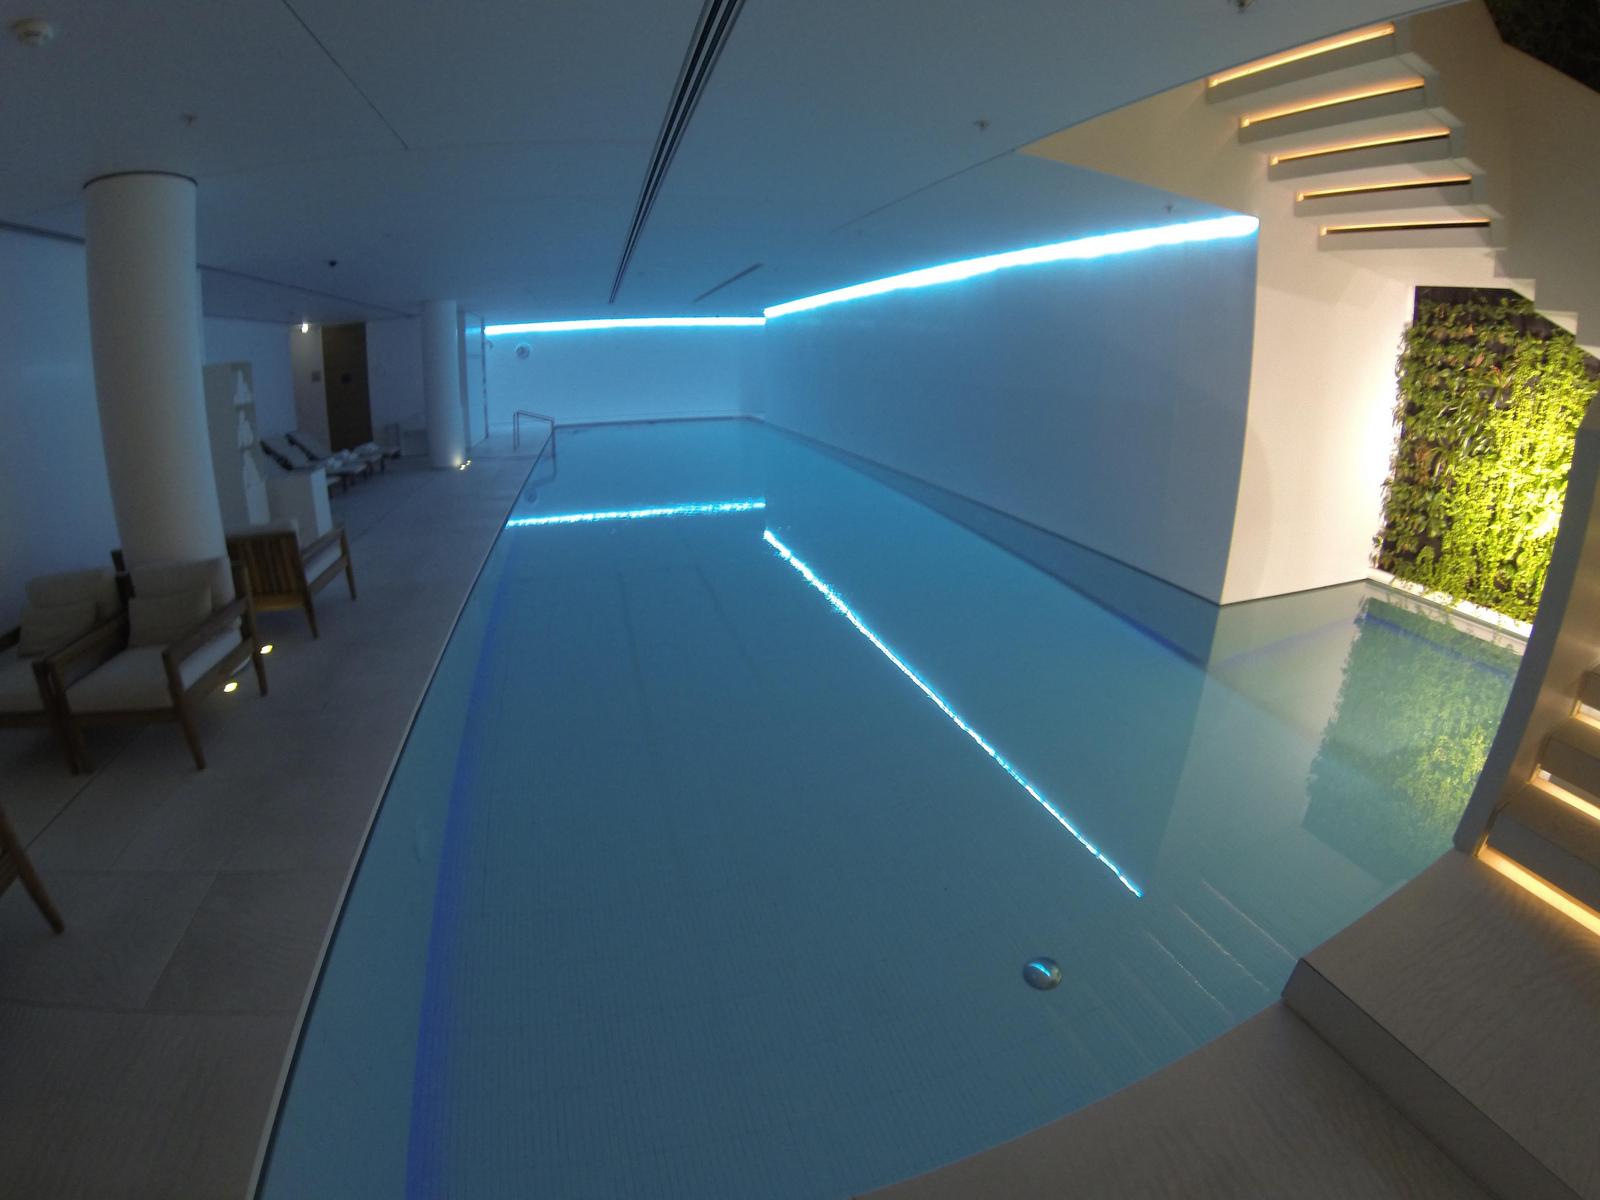 conservatorium-hotel-amsterdam-spa-pool-living-wall-plants.jpg